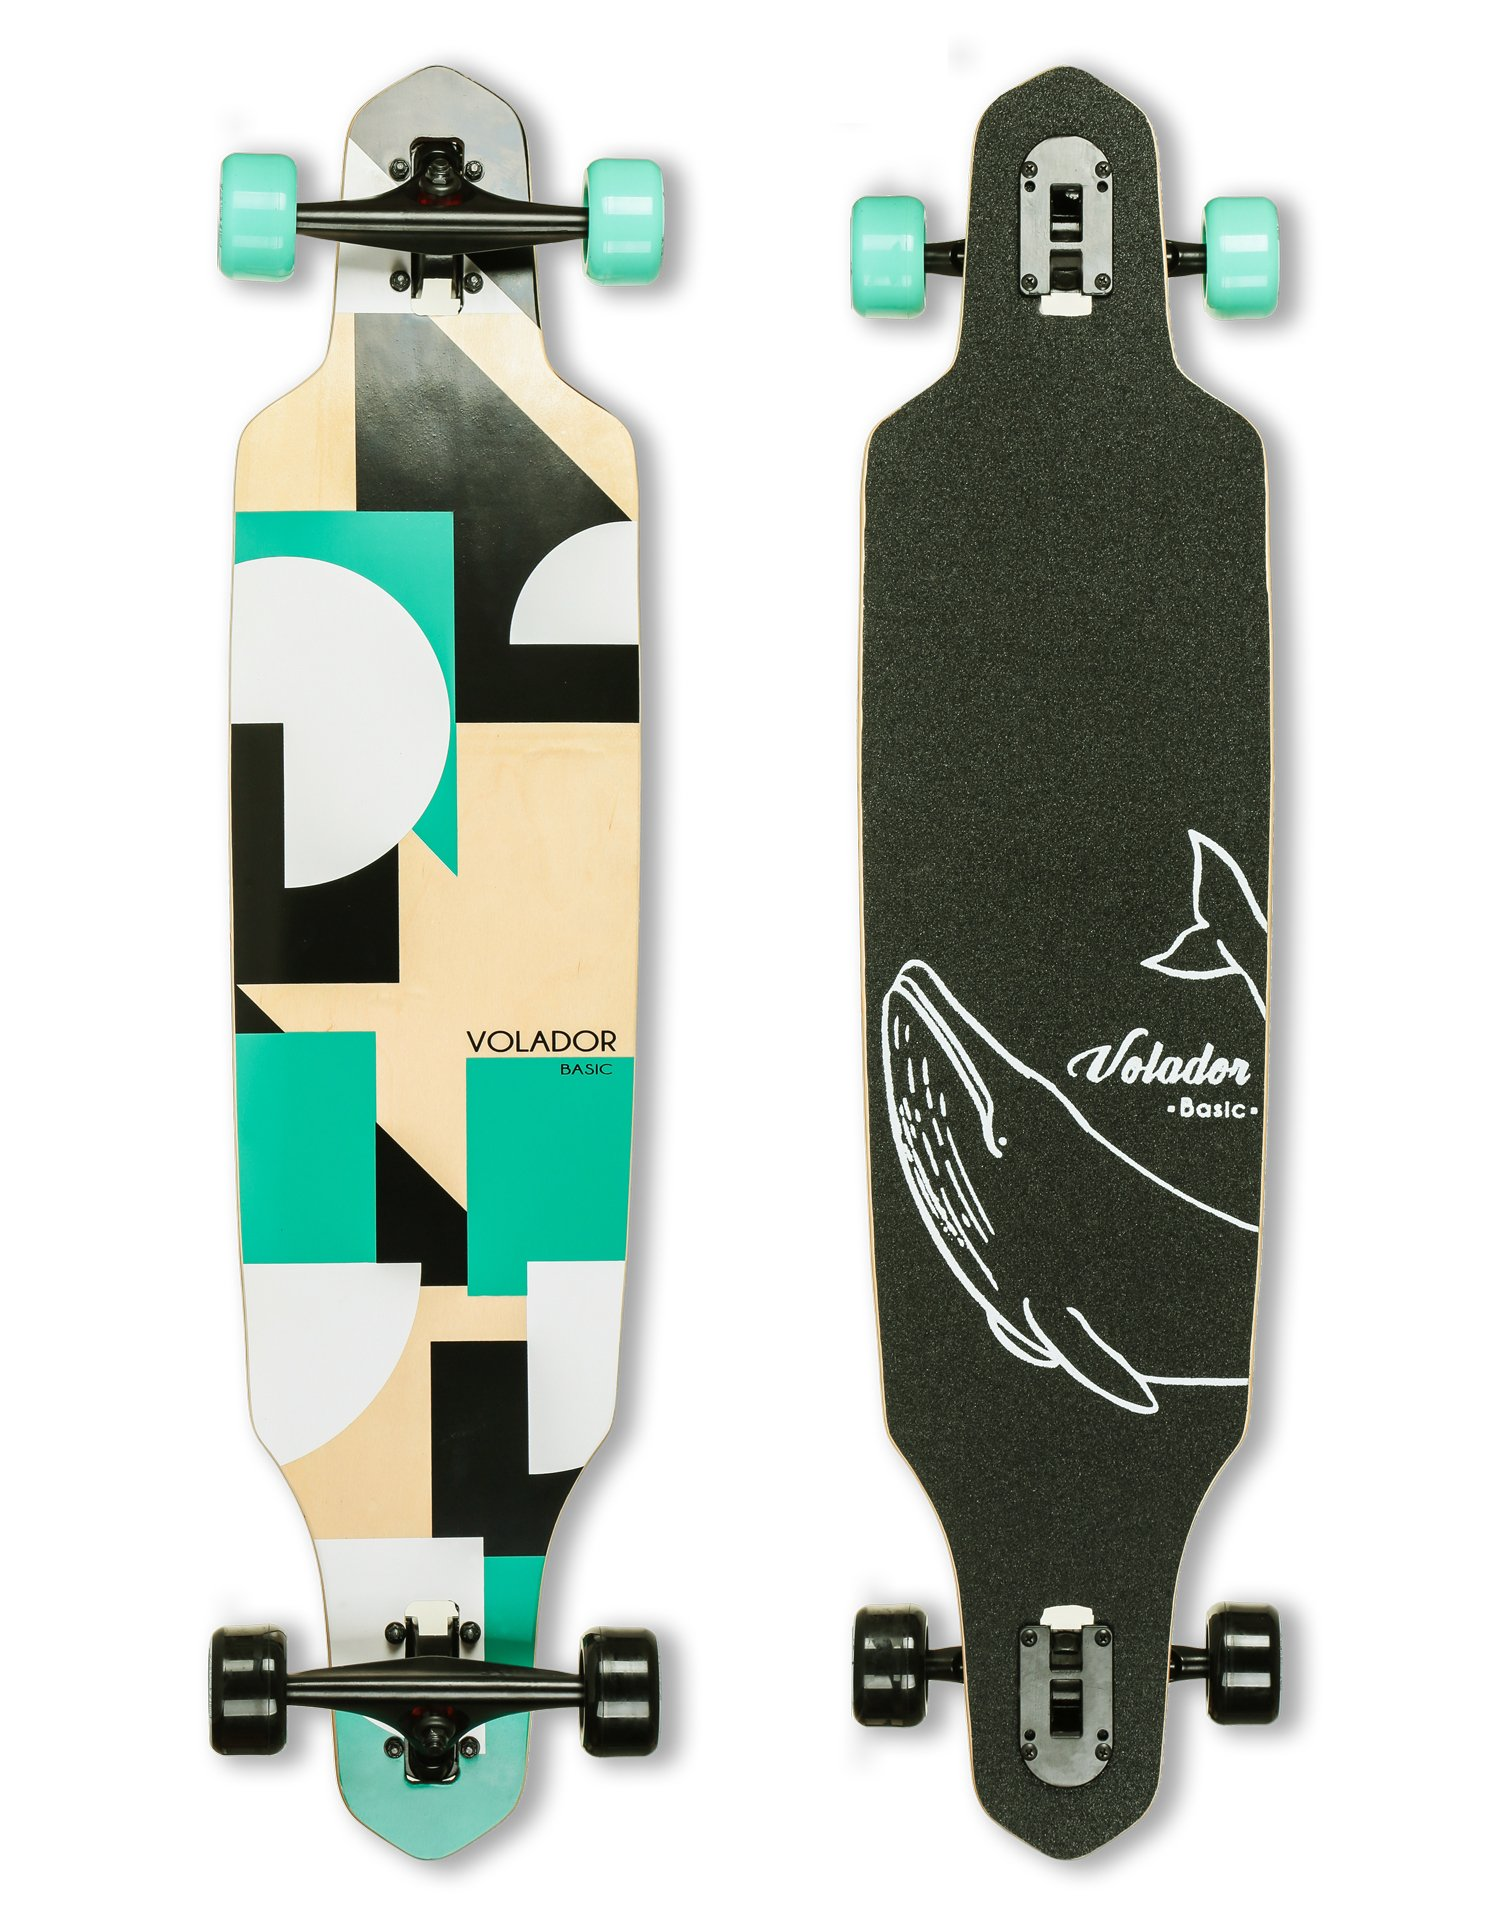 VOLADOR 40inch Maple Longboard - Basic Cruiser (Turquoise)